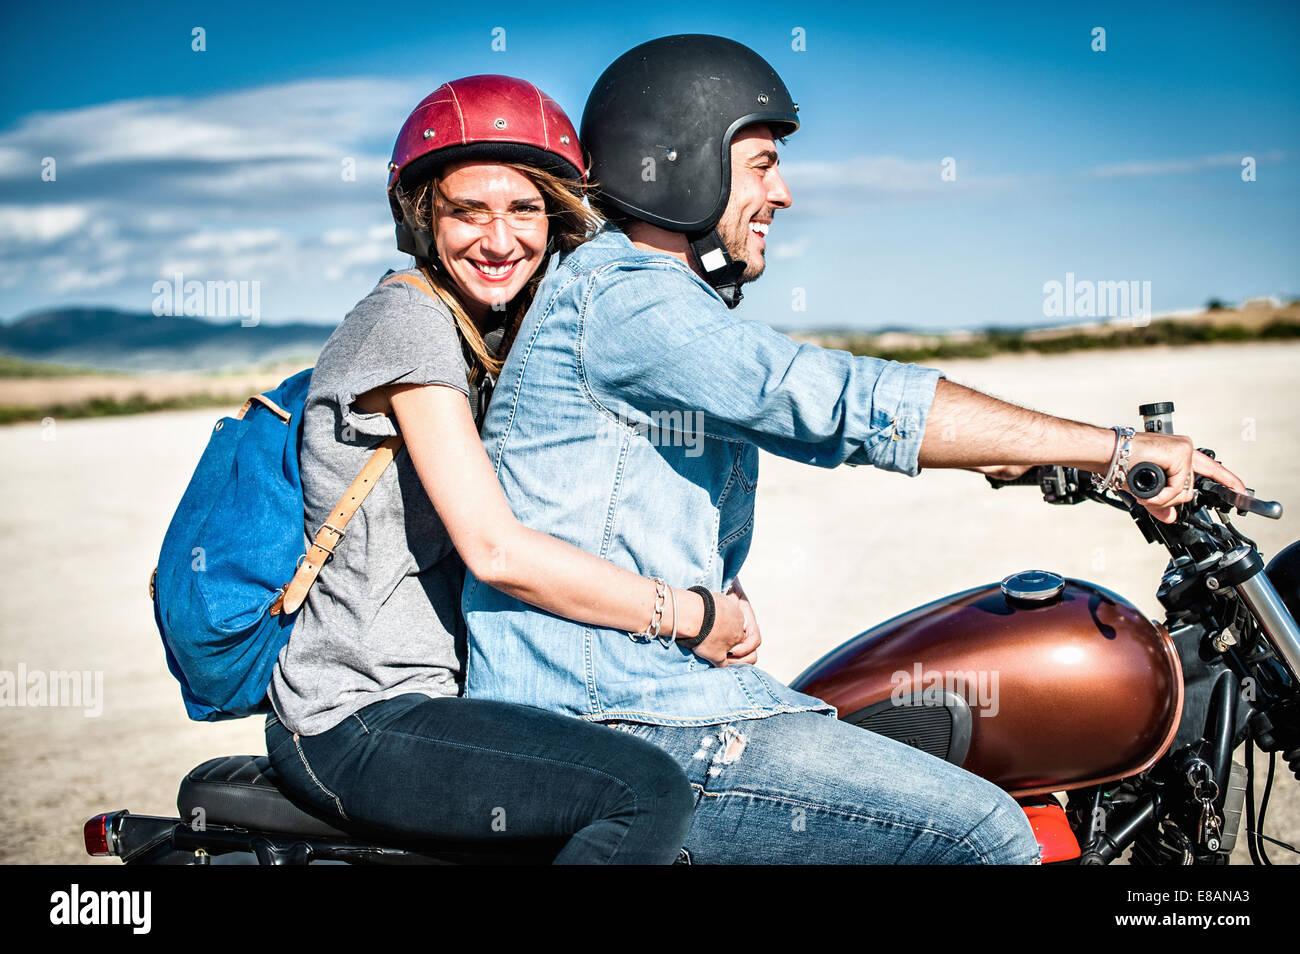 Pareja adulta media montando motocicleta en la árida llanura, Cagliari, Cerdeña, Italia Imagen De Stock